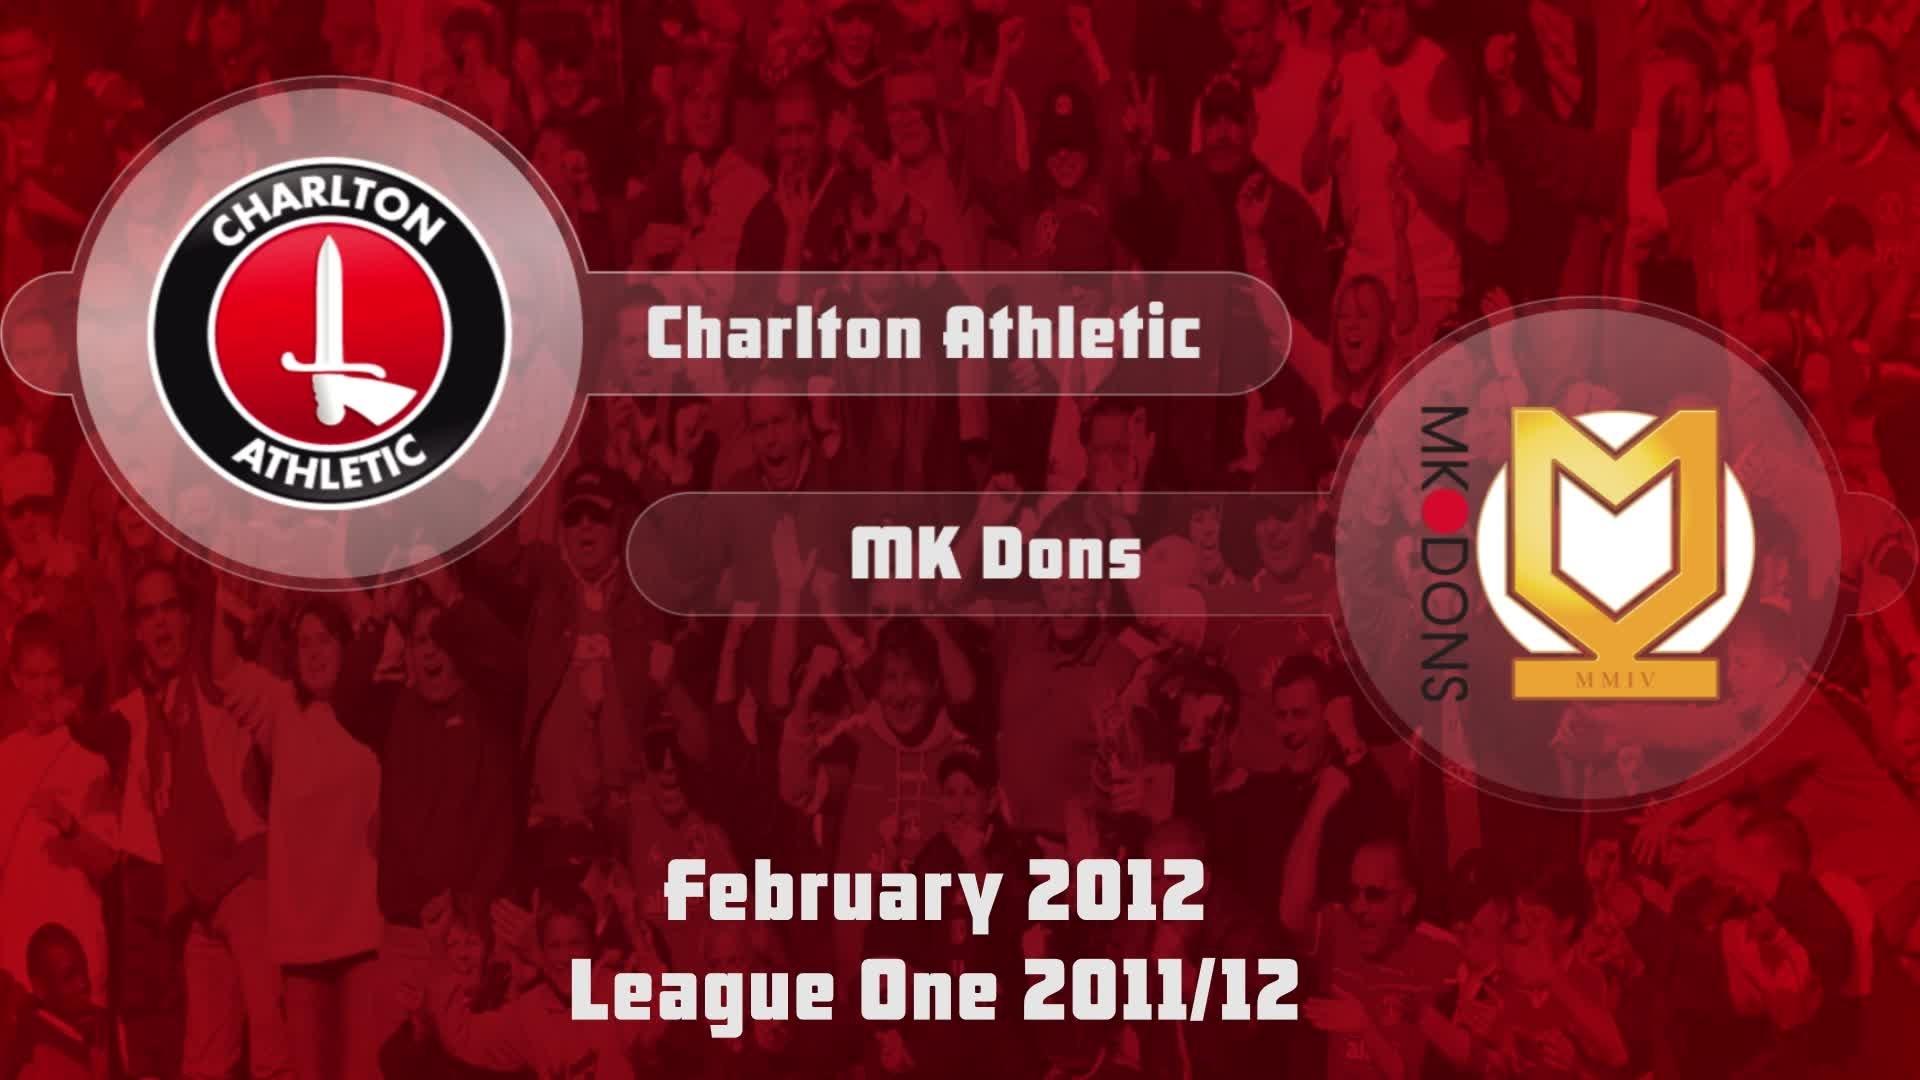 35 HIGHLIGHTS | Charlton 2 MK Dons 1 (Feb 2012)